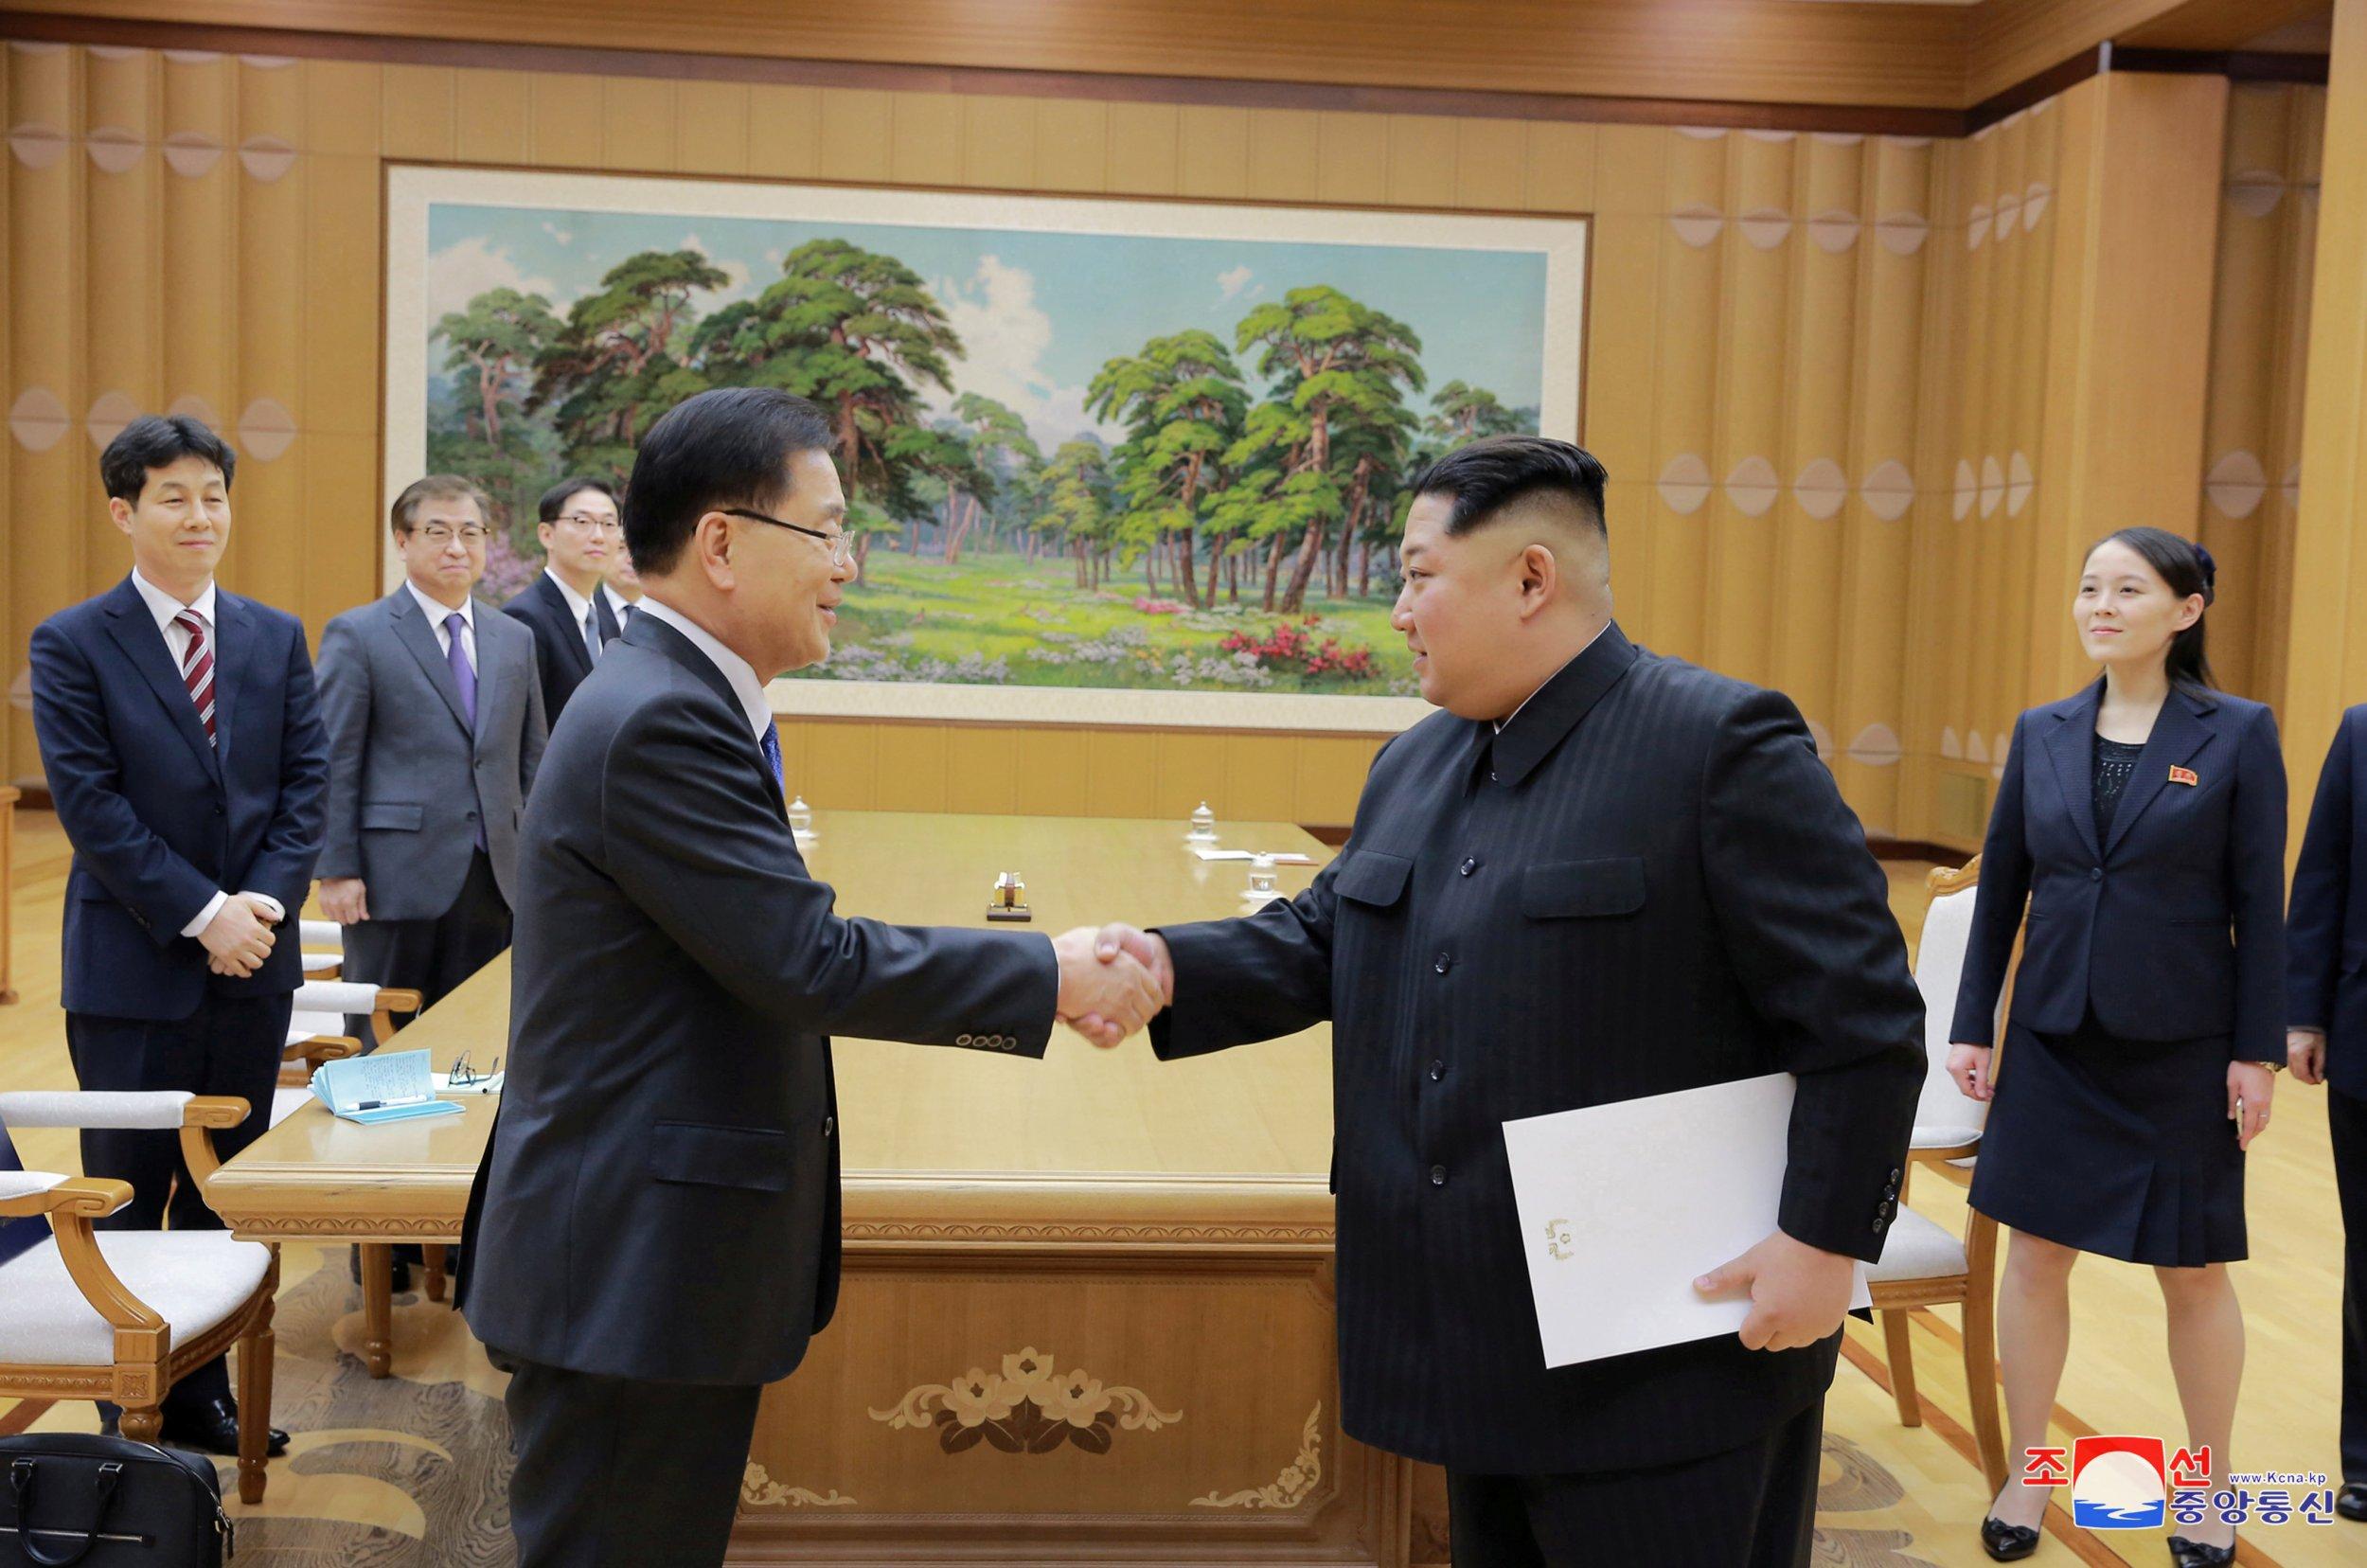 RTS1MB8X Kim Jong Un meets South Korean delegation Chung Eui-yong